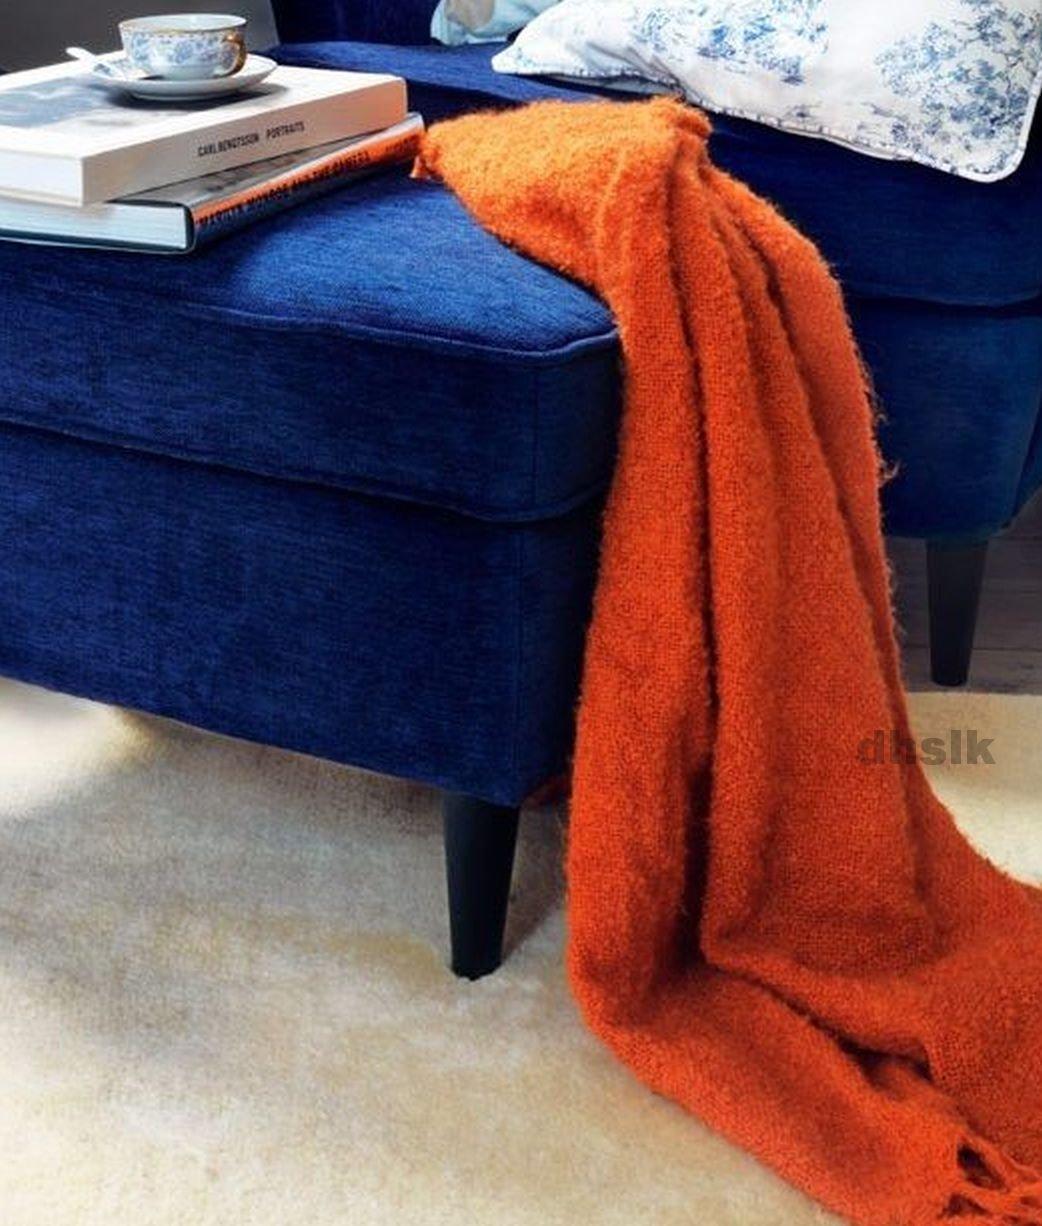 IKEA RITVA ORANGE Throw BLANKET Afghan SOFT Mohair Blend HALLOWEEN Autumn